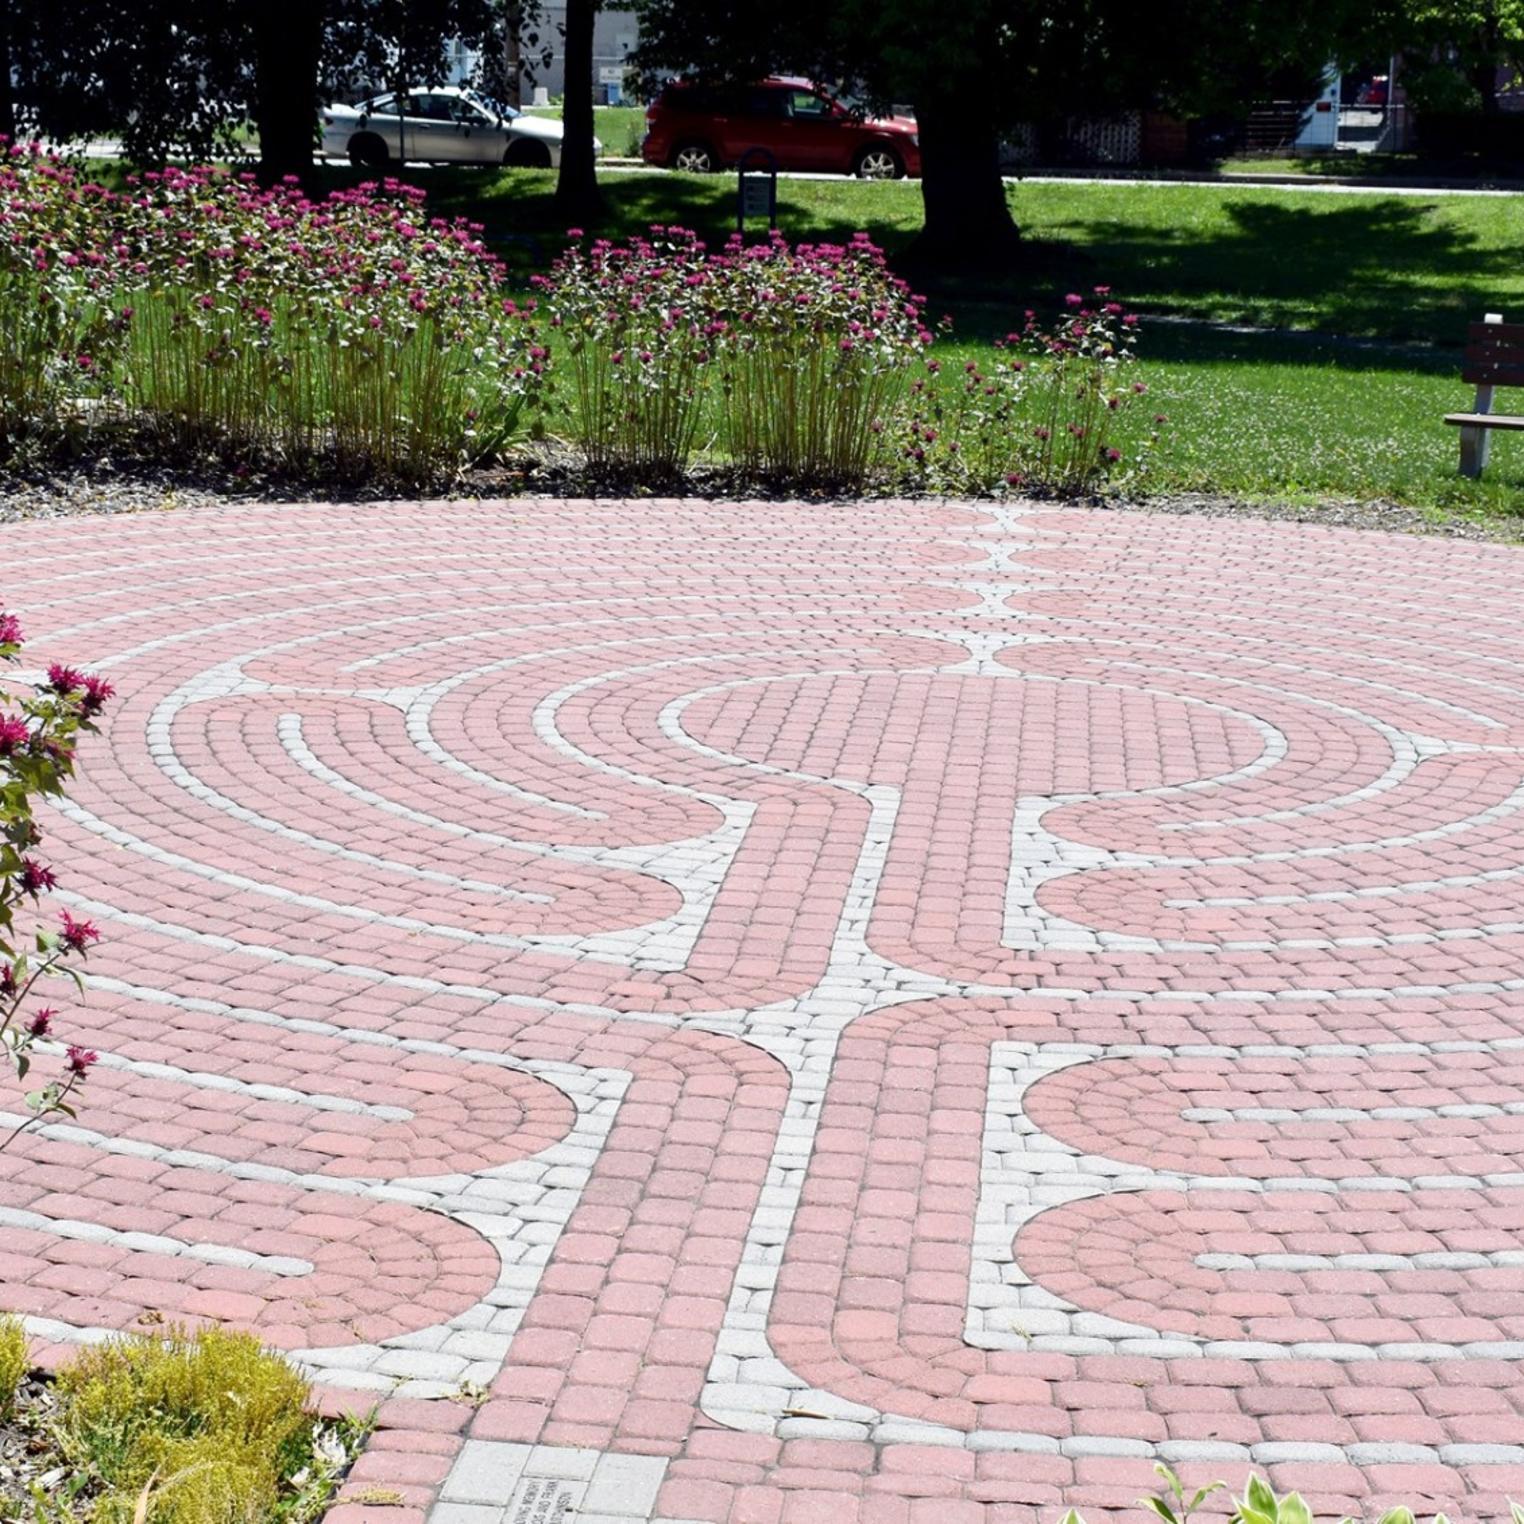 Biddle Mission Park Labyrinth